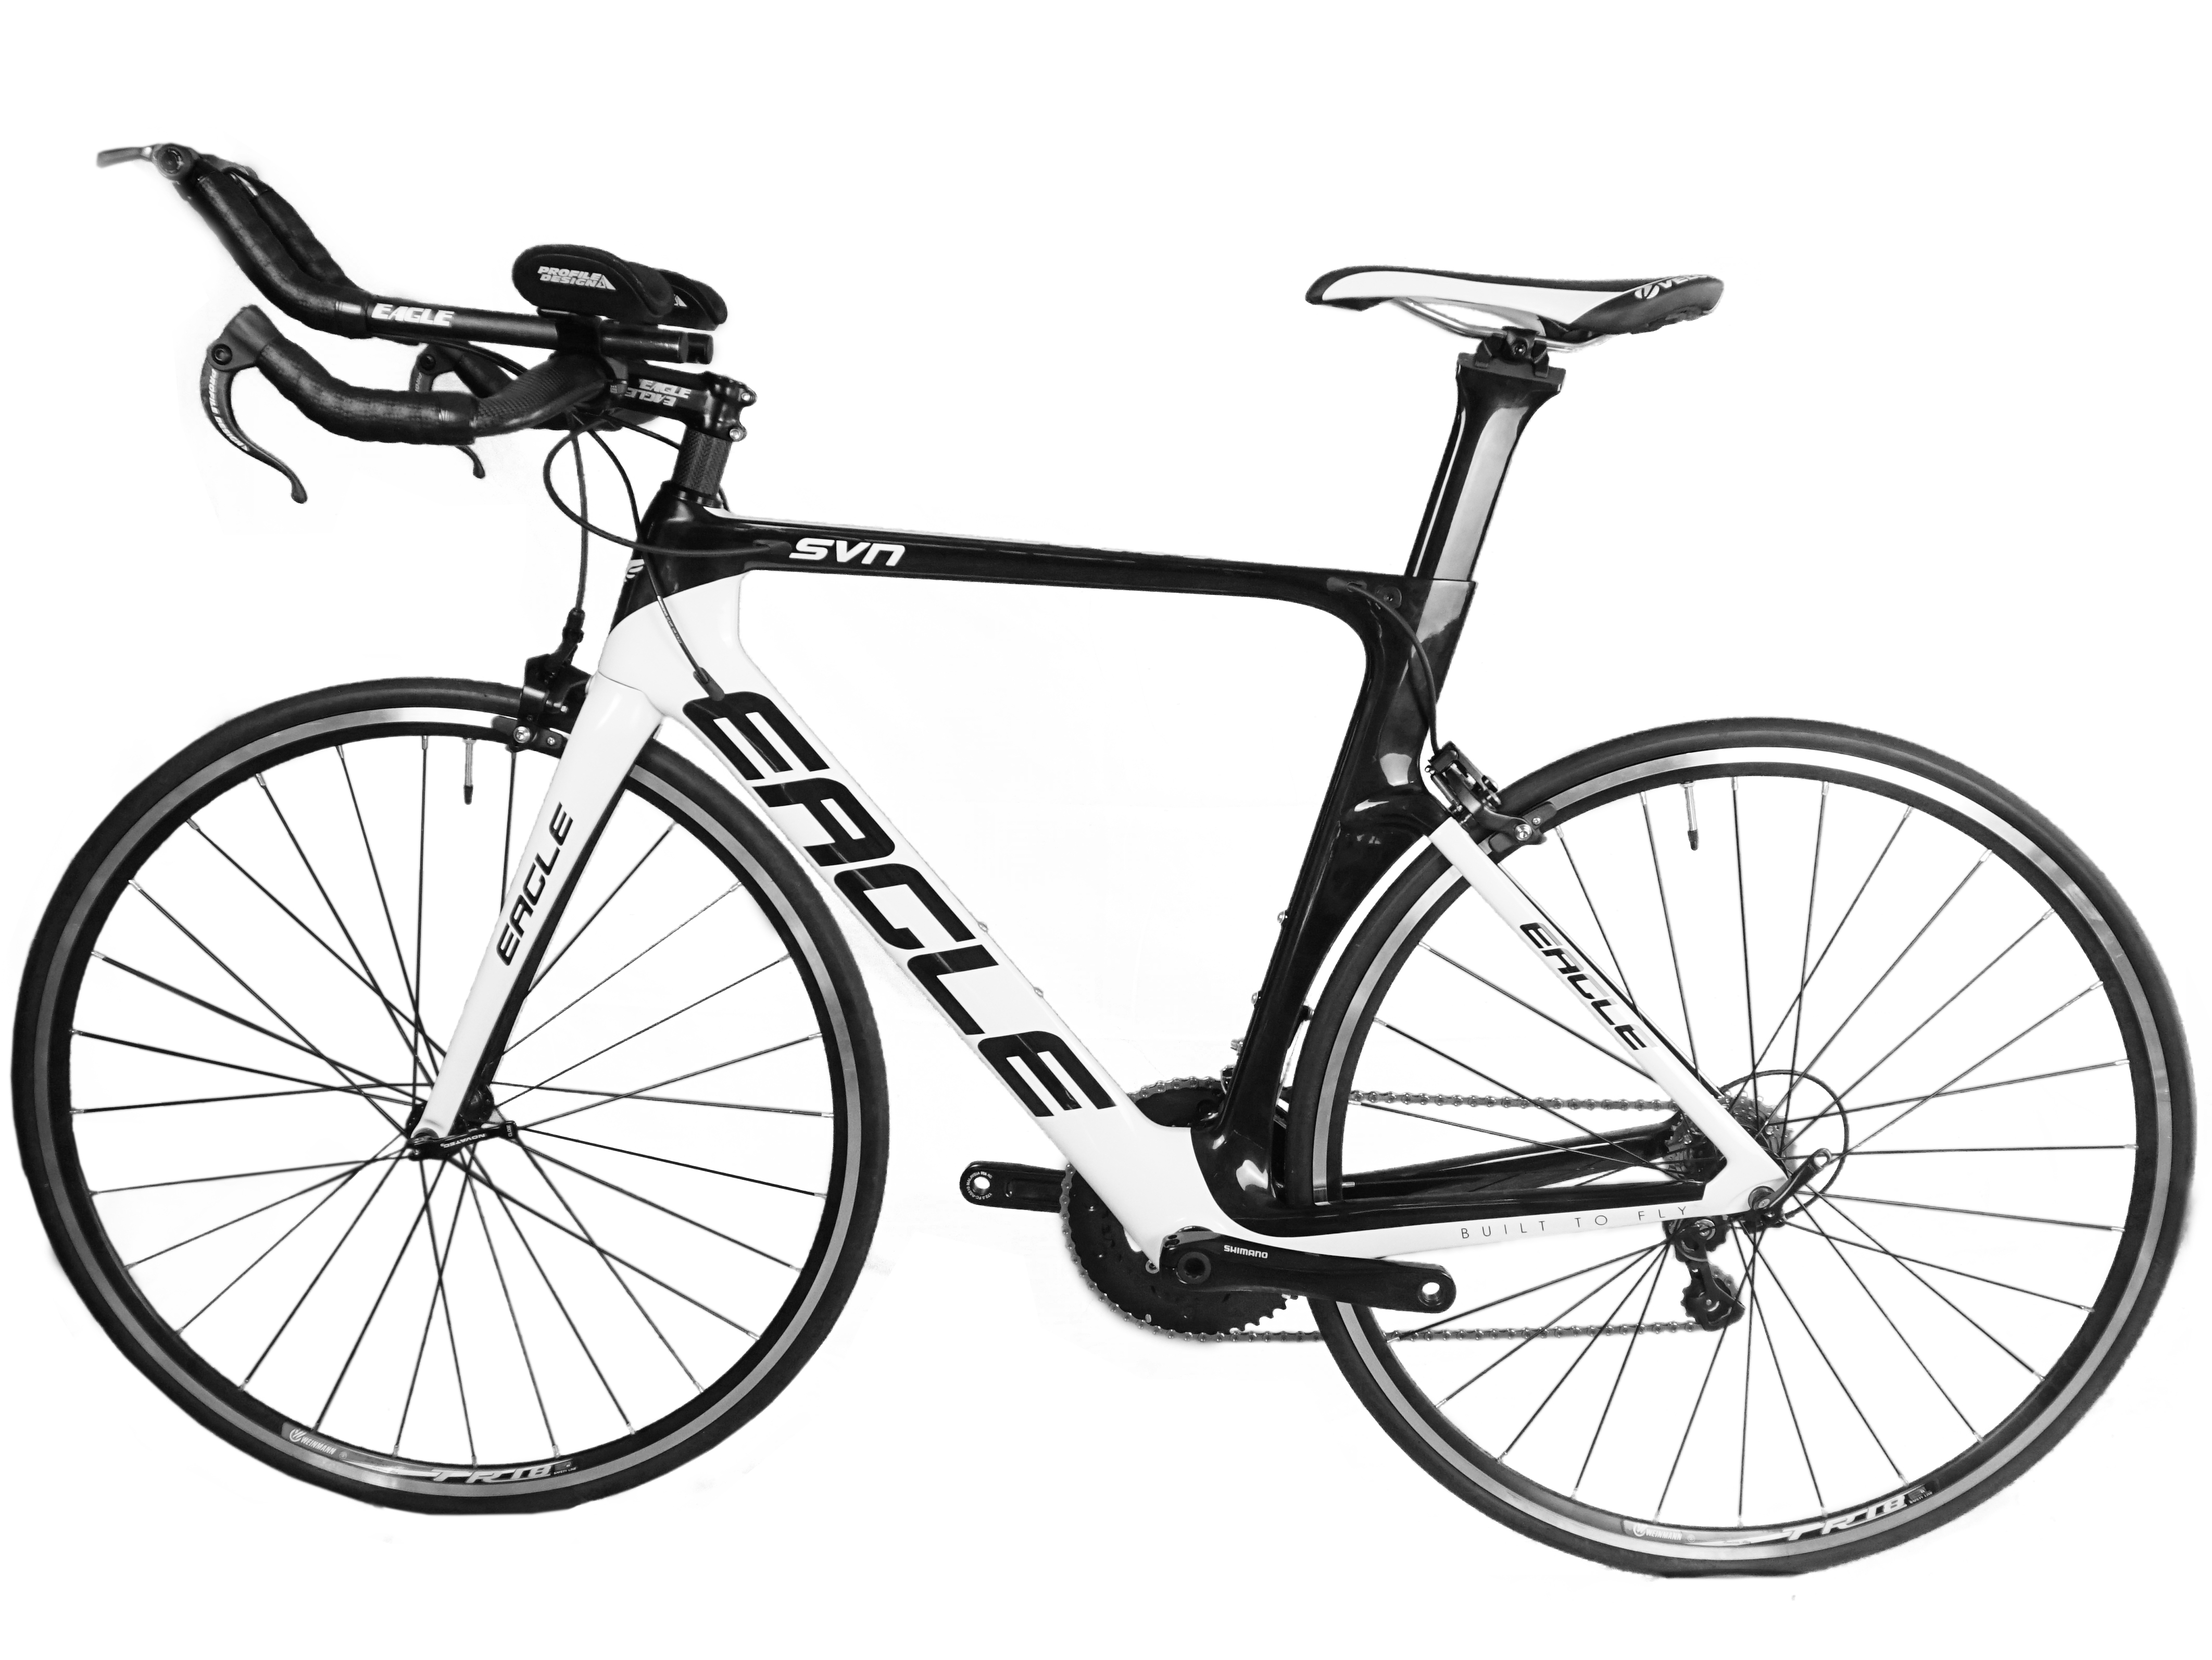 Eagle T1 Carbon Fiber Triathlon Or Time Trial Bike